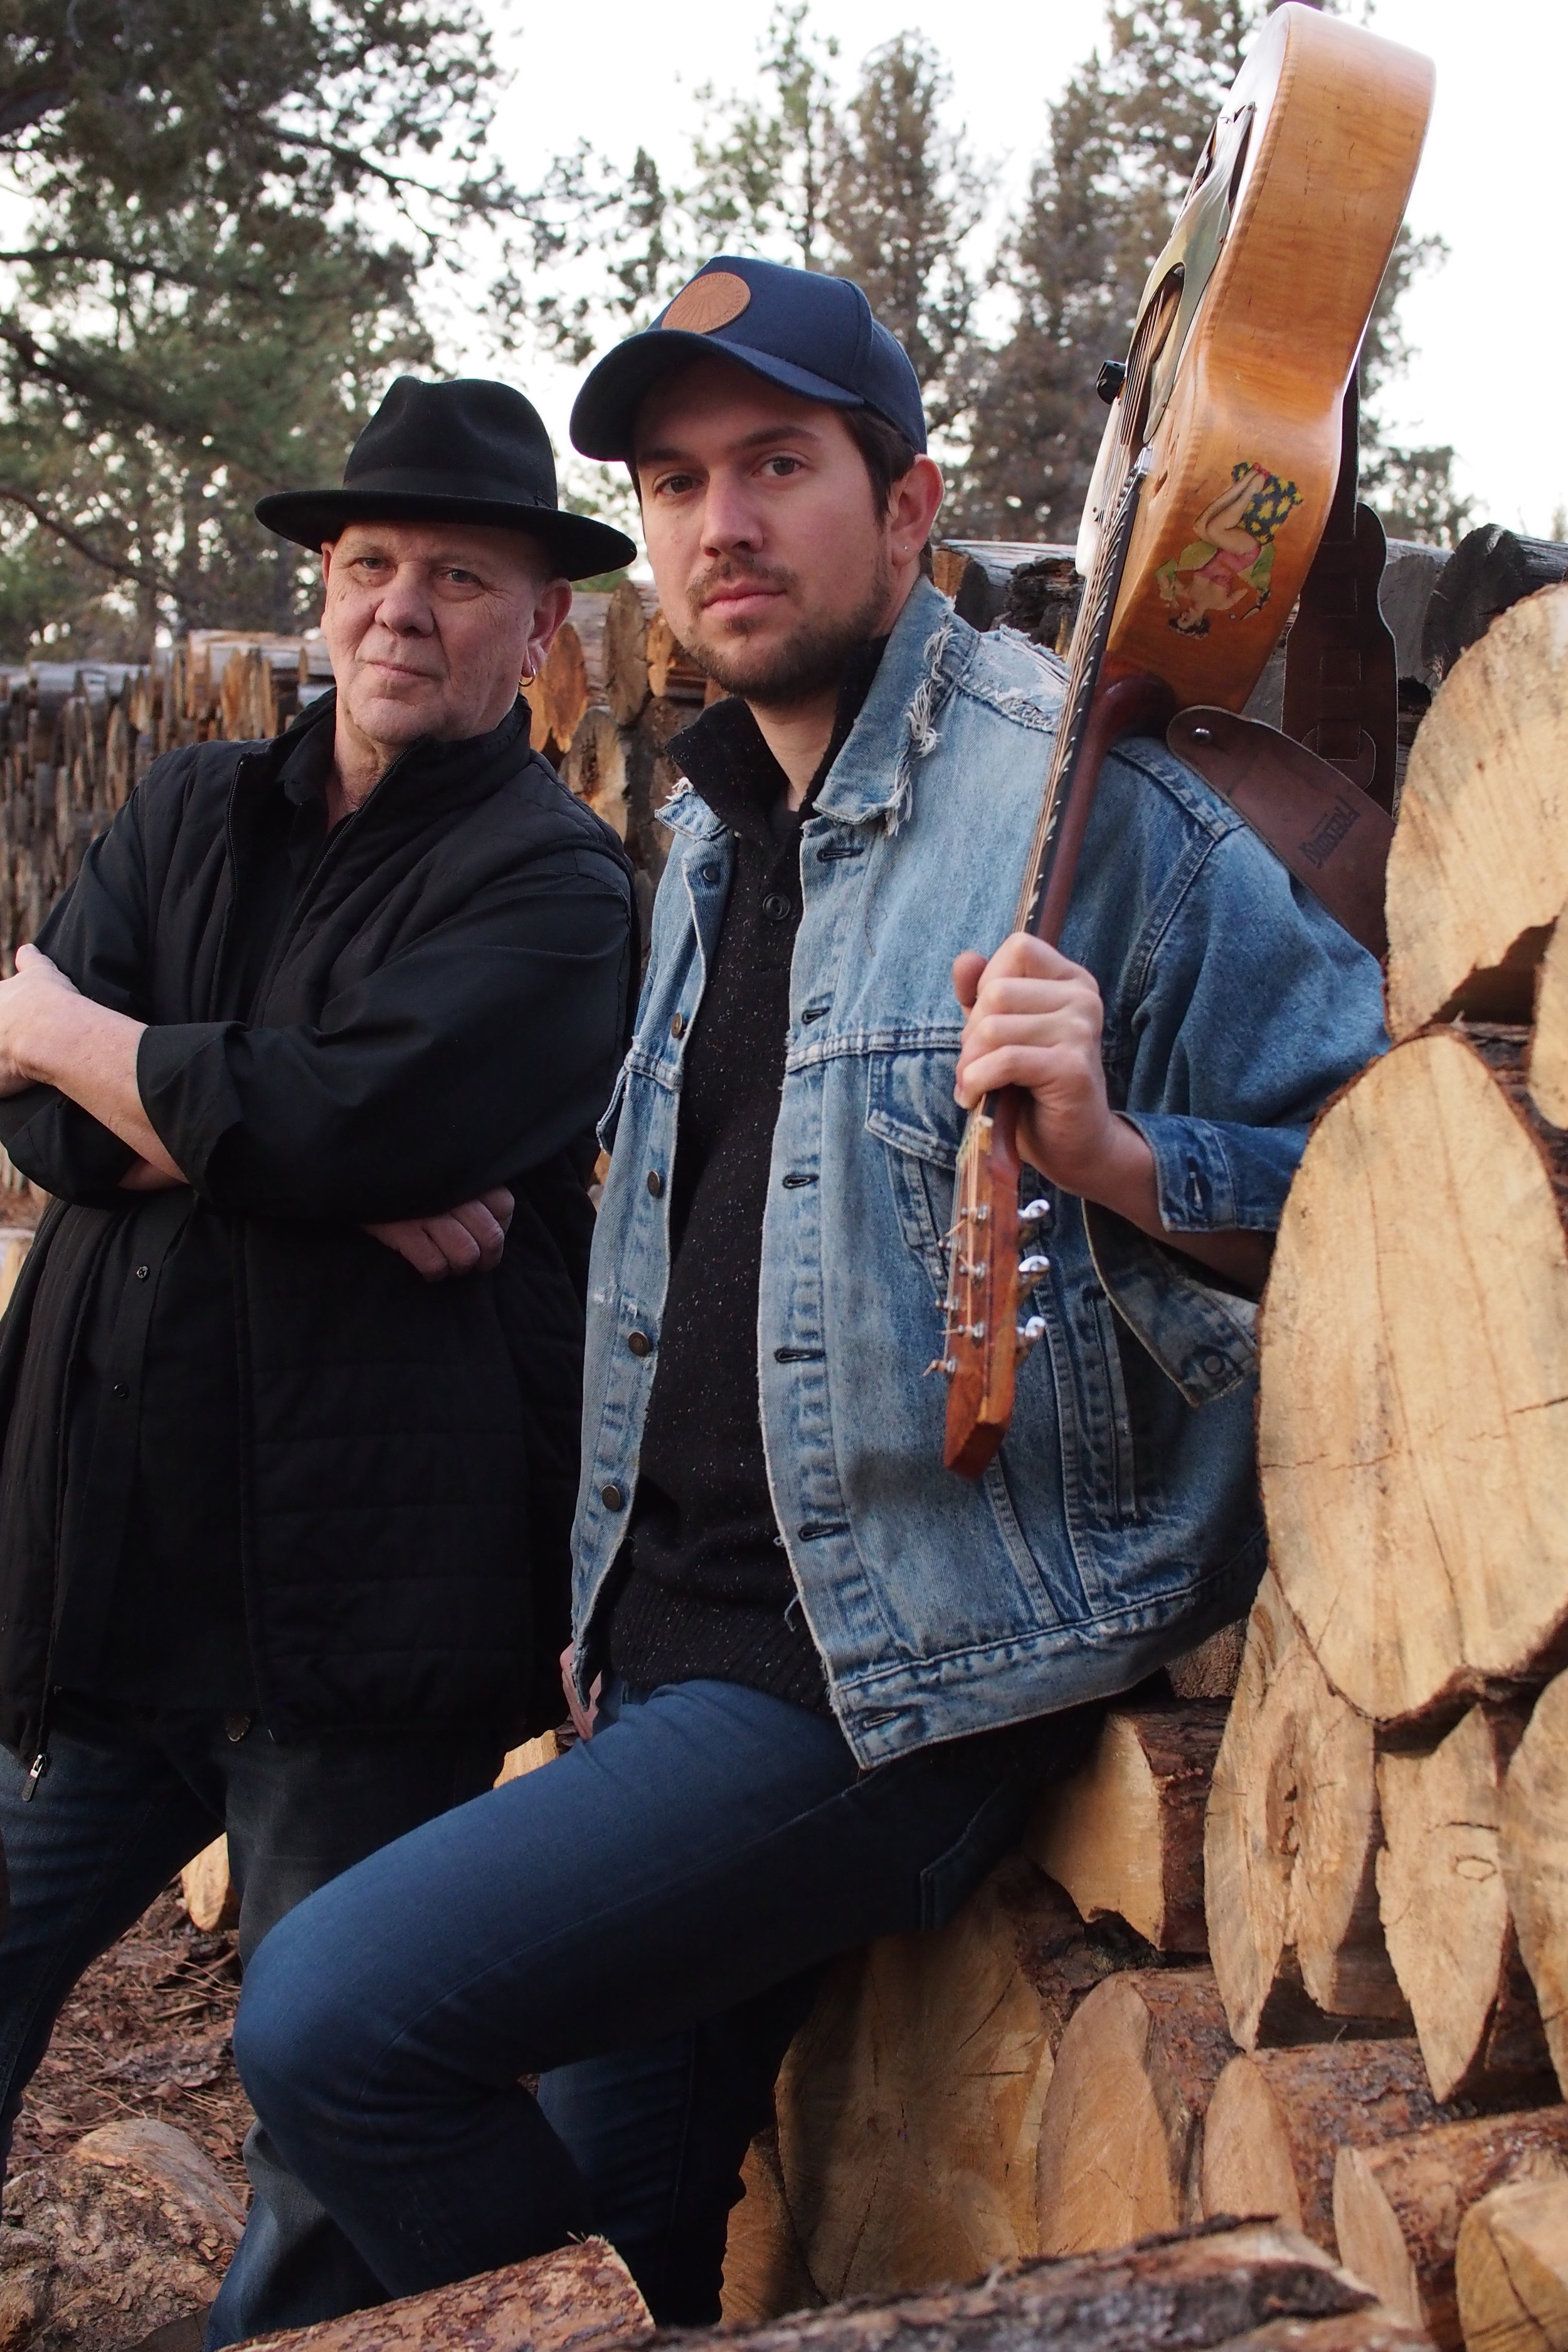 David Jacobs-Strain and Bob Beach